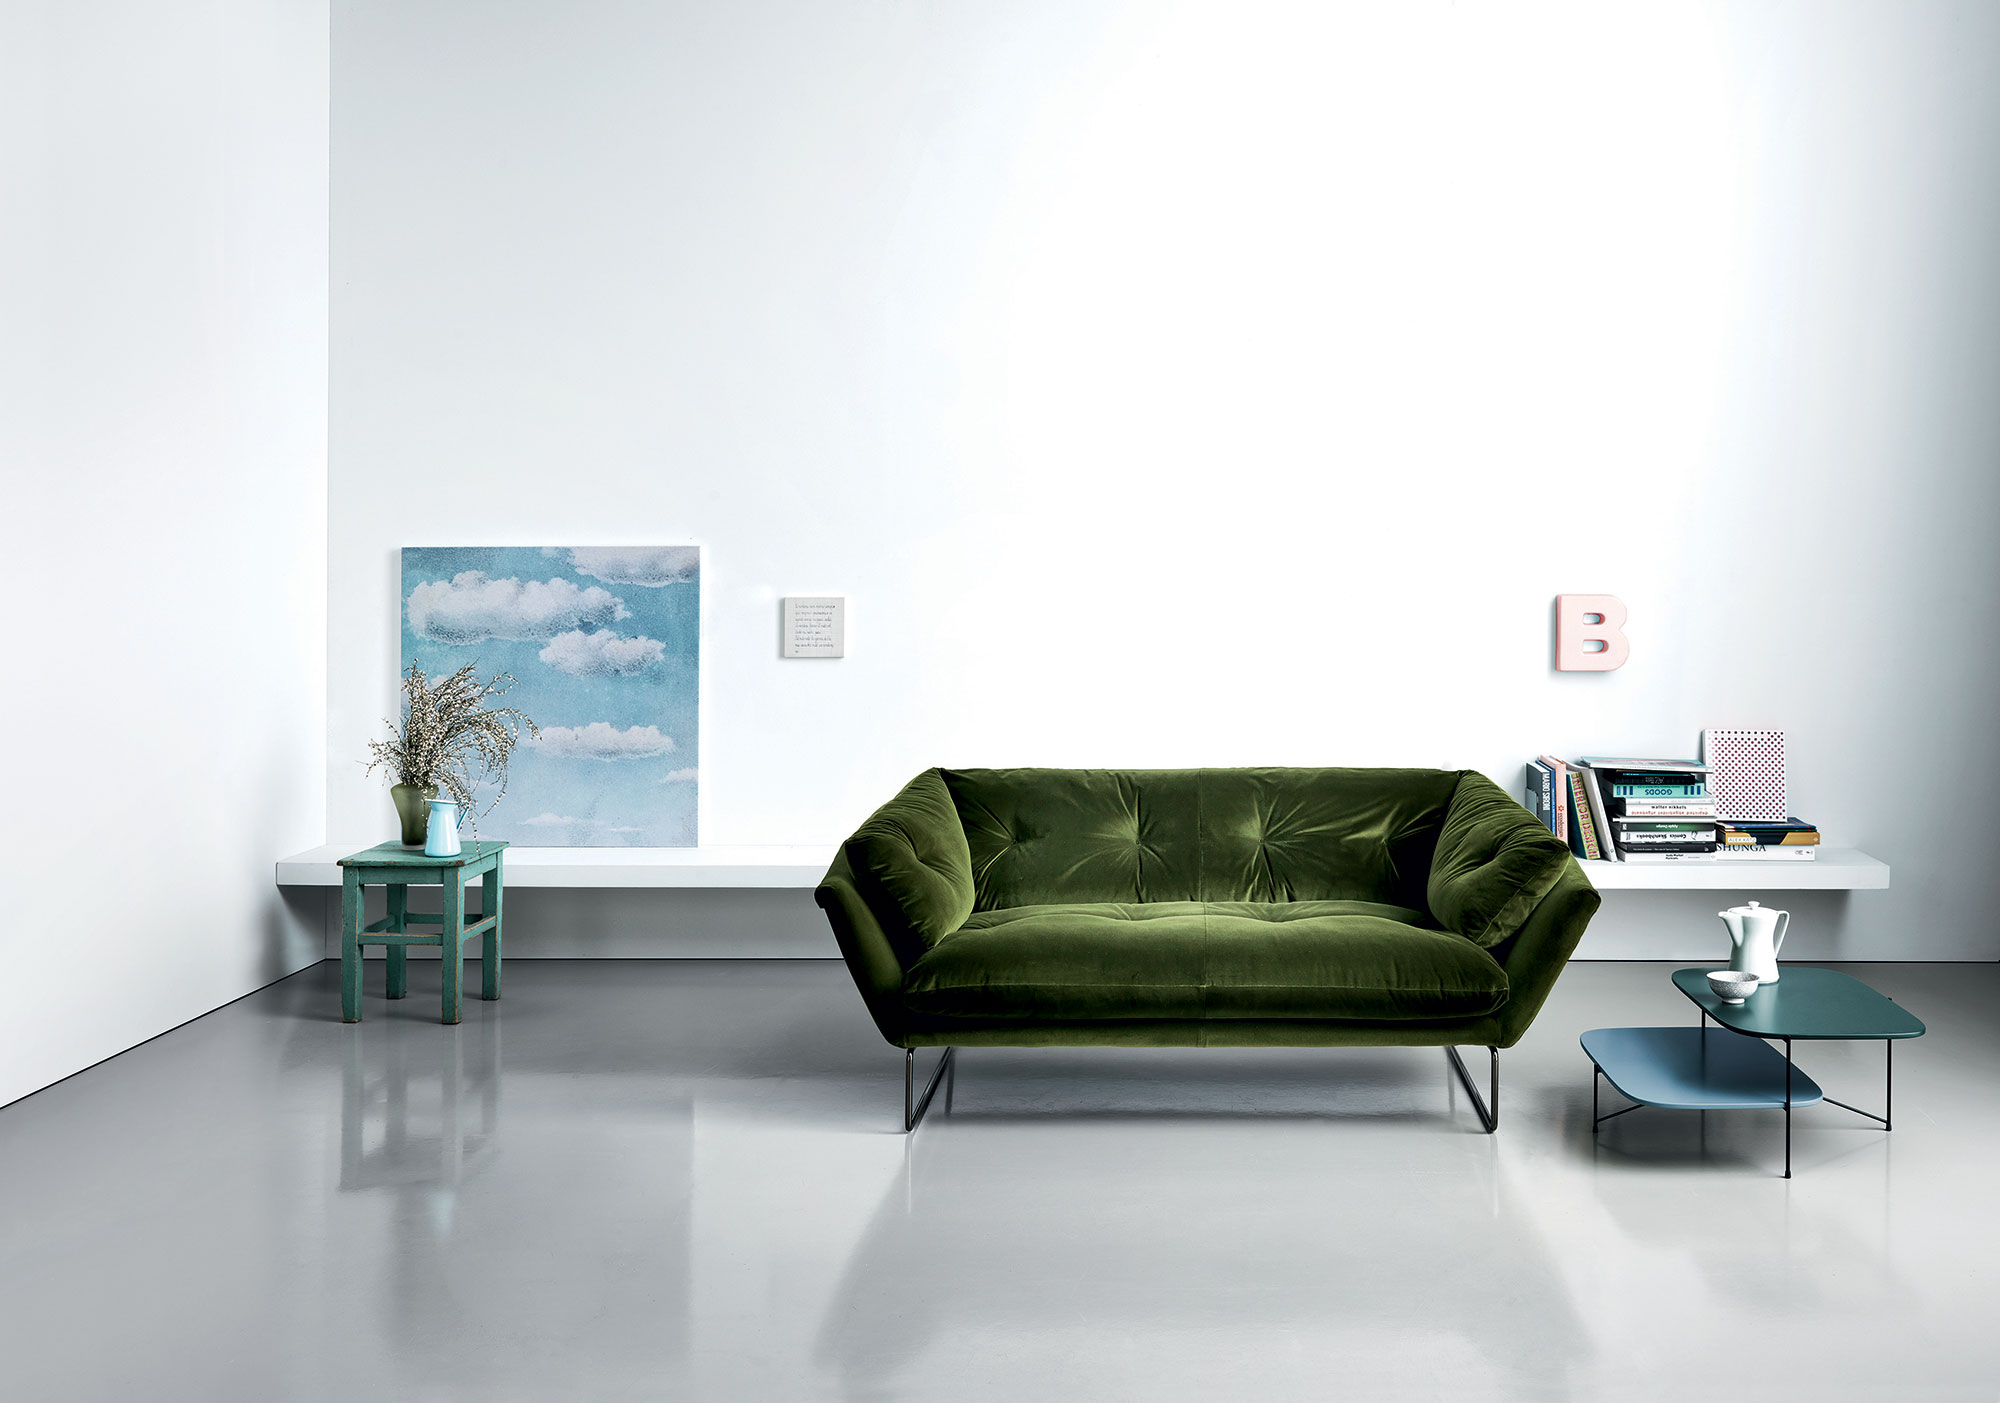 Boston Home Decor Show, Sedia Modern Furniture, New York Suite Sofa designed by Sergio Bicego, 2015 for Saba Italia.